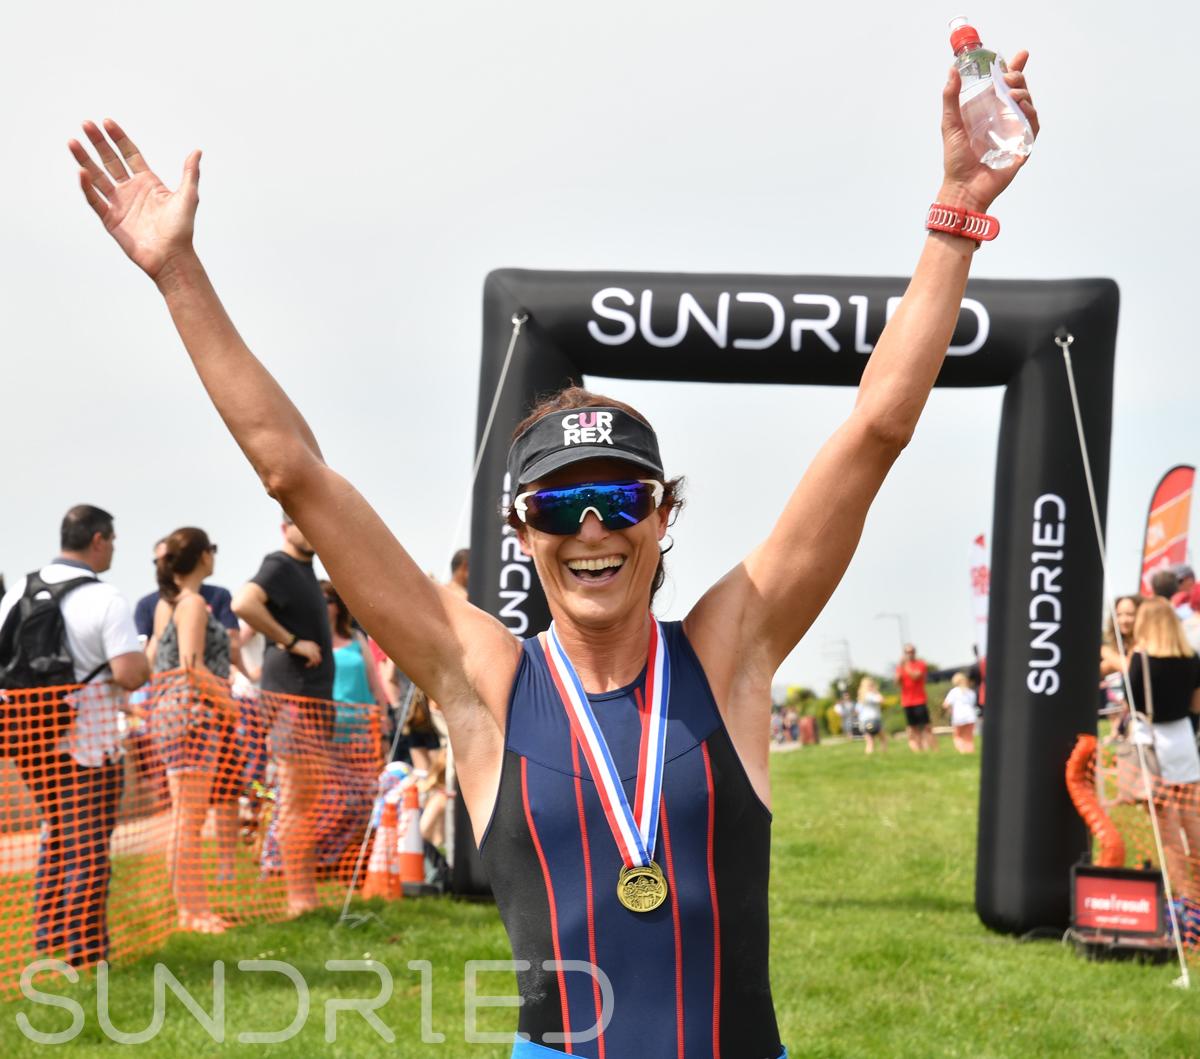 Sundried-Southend-Triathlon-2017-May-0730.jpg